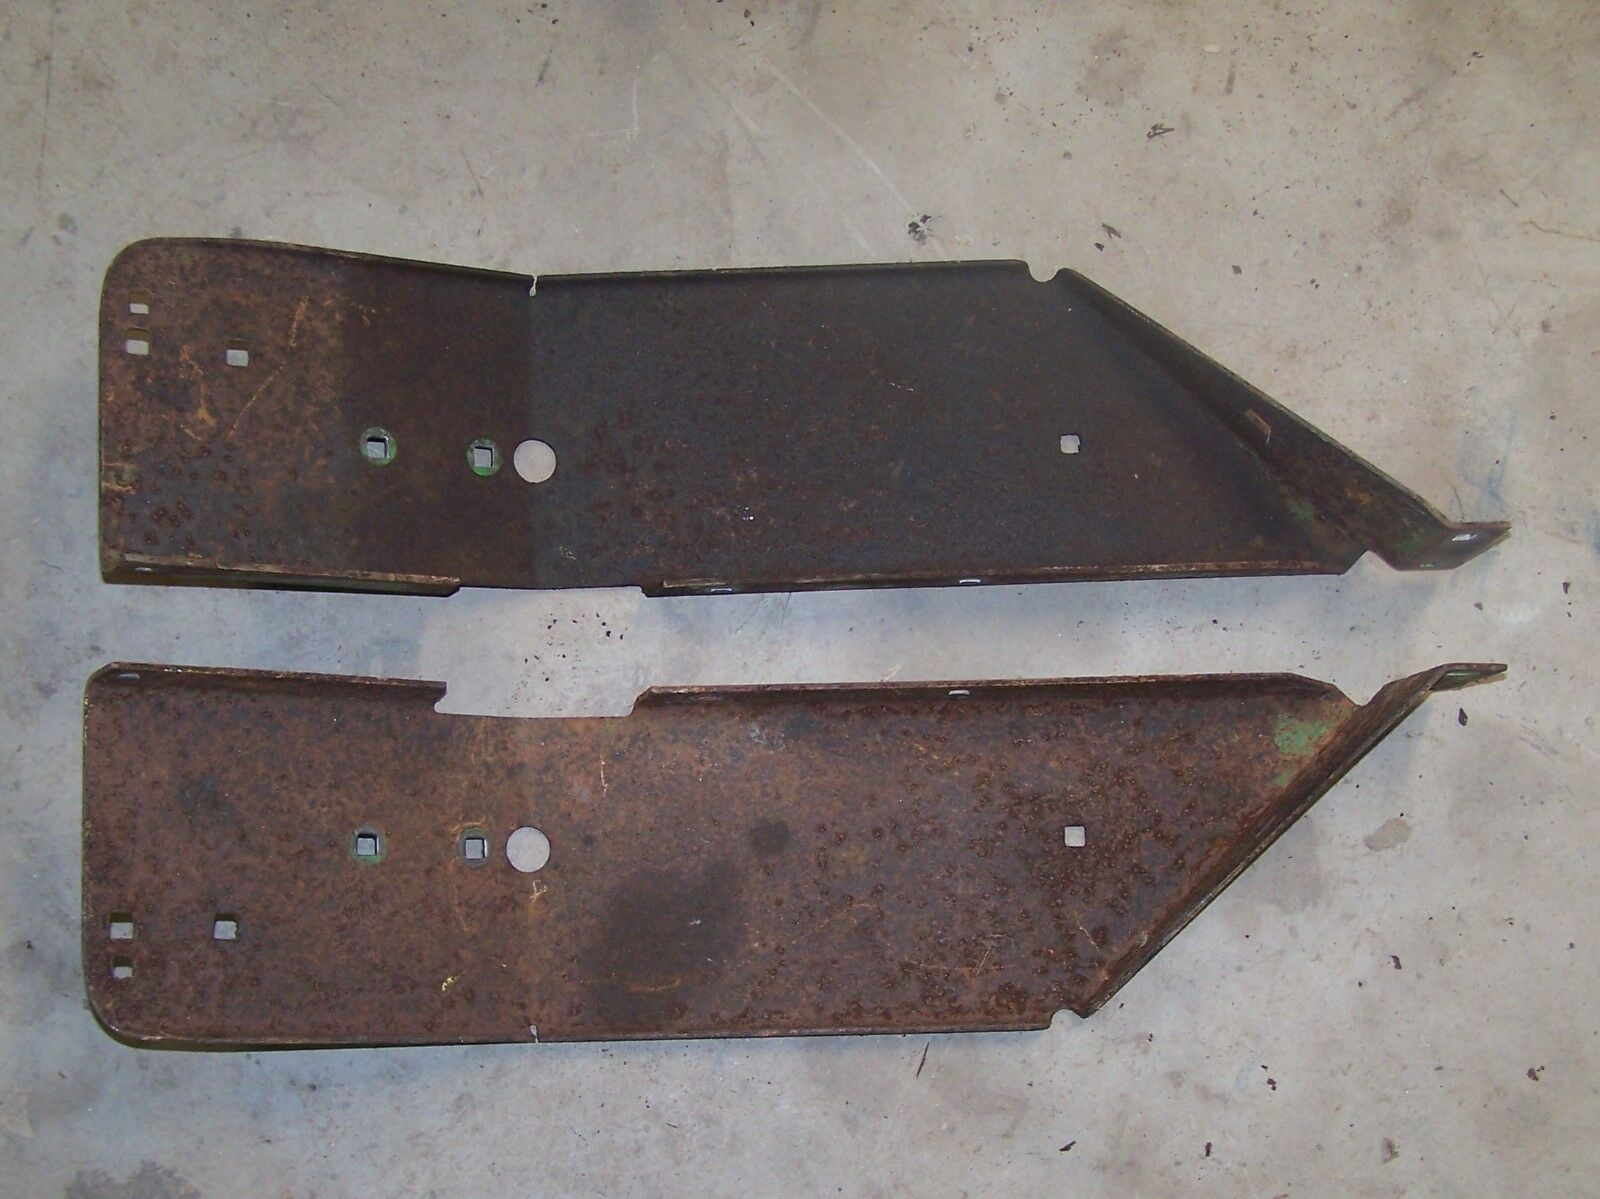 John Deere utilizado 110 rojoondo Fender izquierda & derecha pan de pie NN1